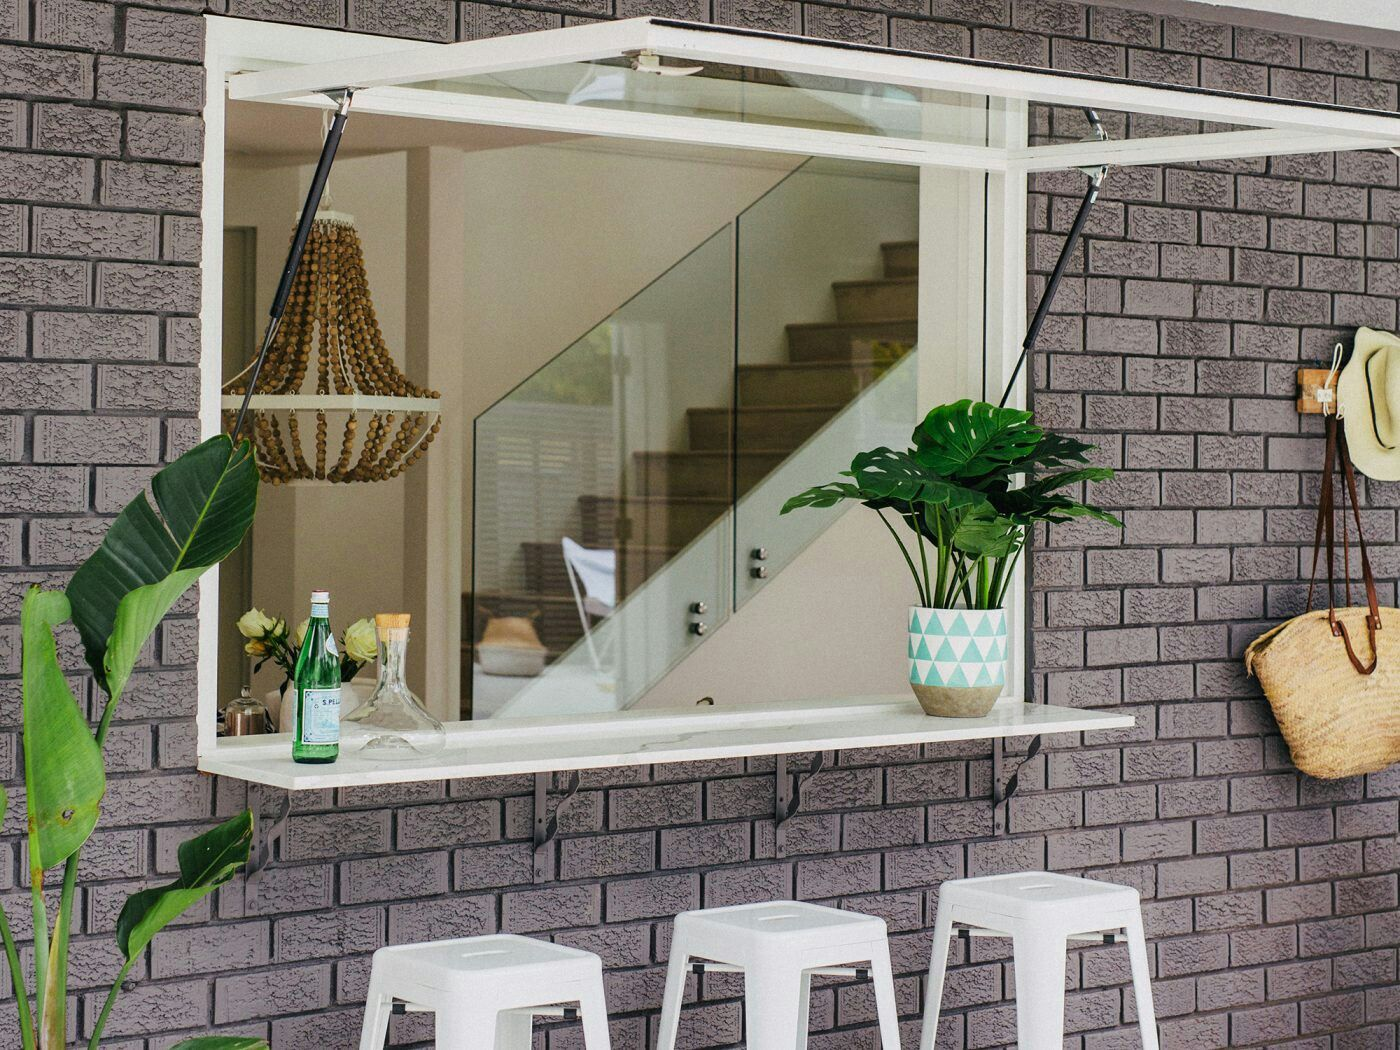 Kitchen servery window ideas  bifold windows open kitchen bar and servery  house exterior